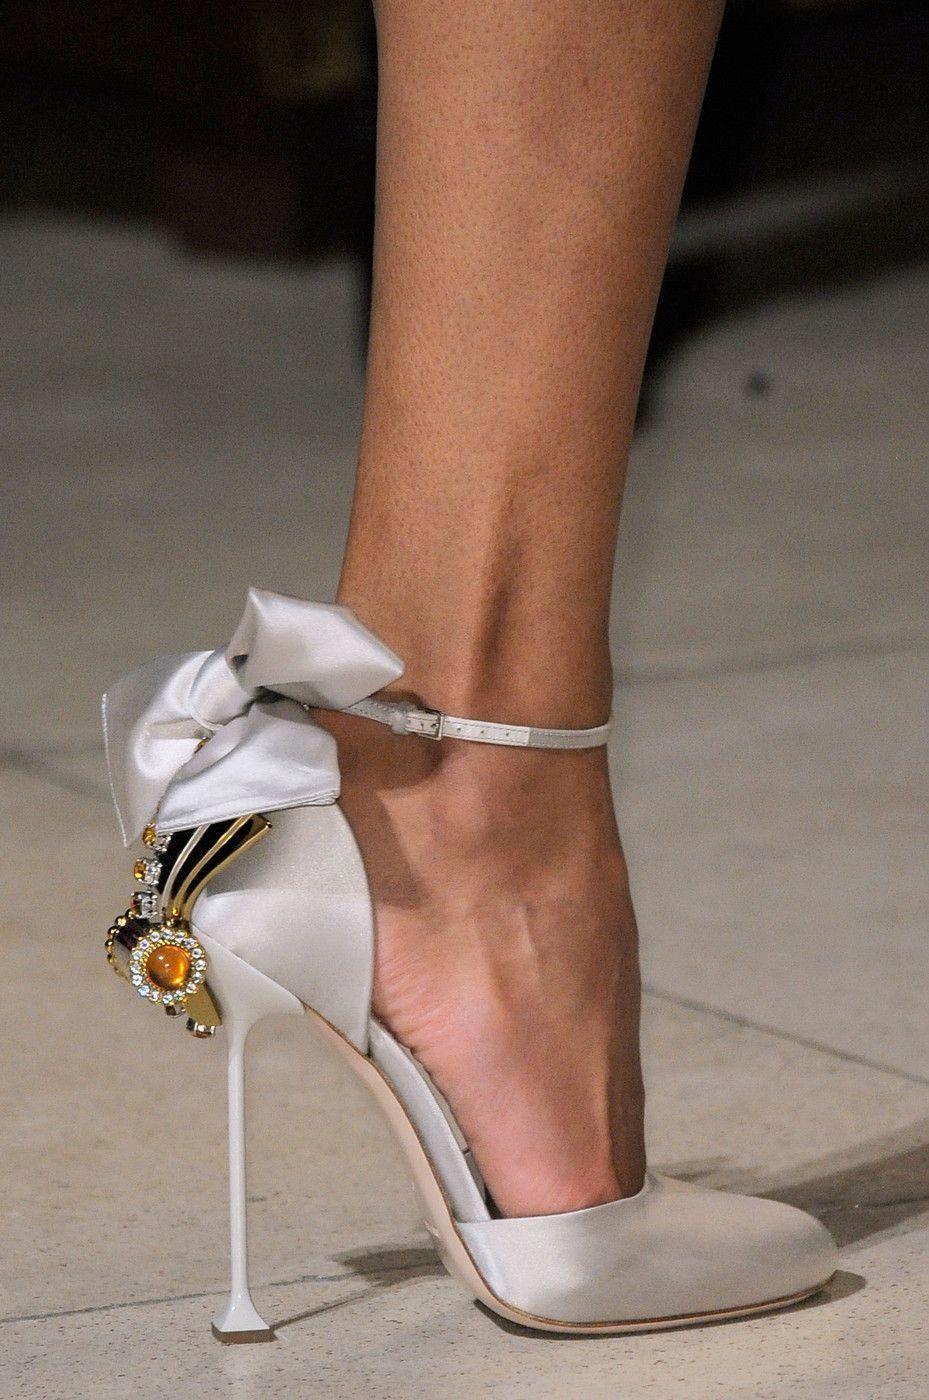 4273d87b9f53 fashion Ra  Miu Miu Güz 2016 shoes ayakkabı stiletto  MiuMiu